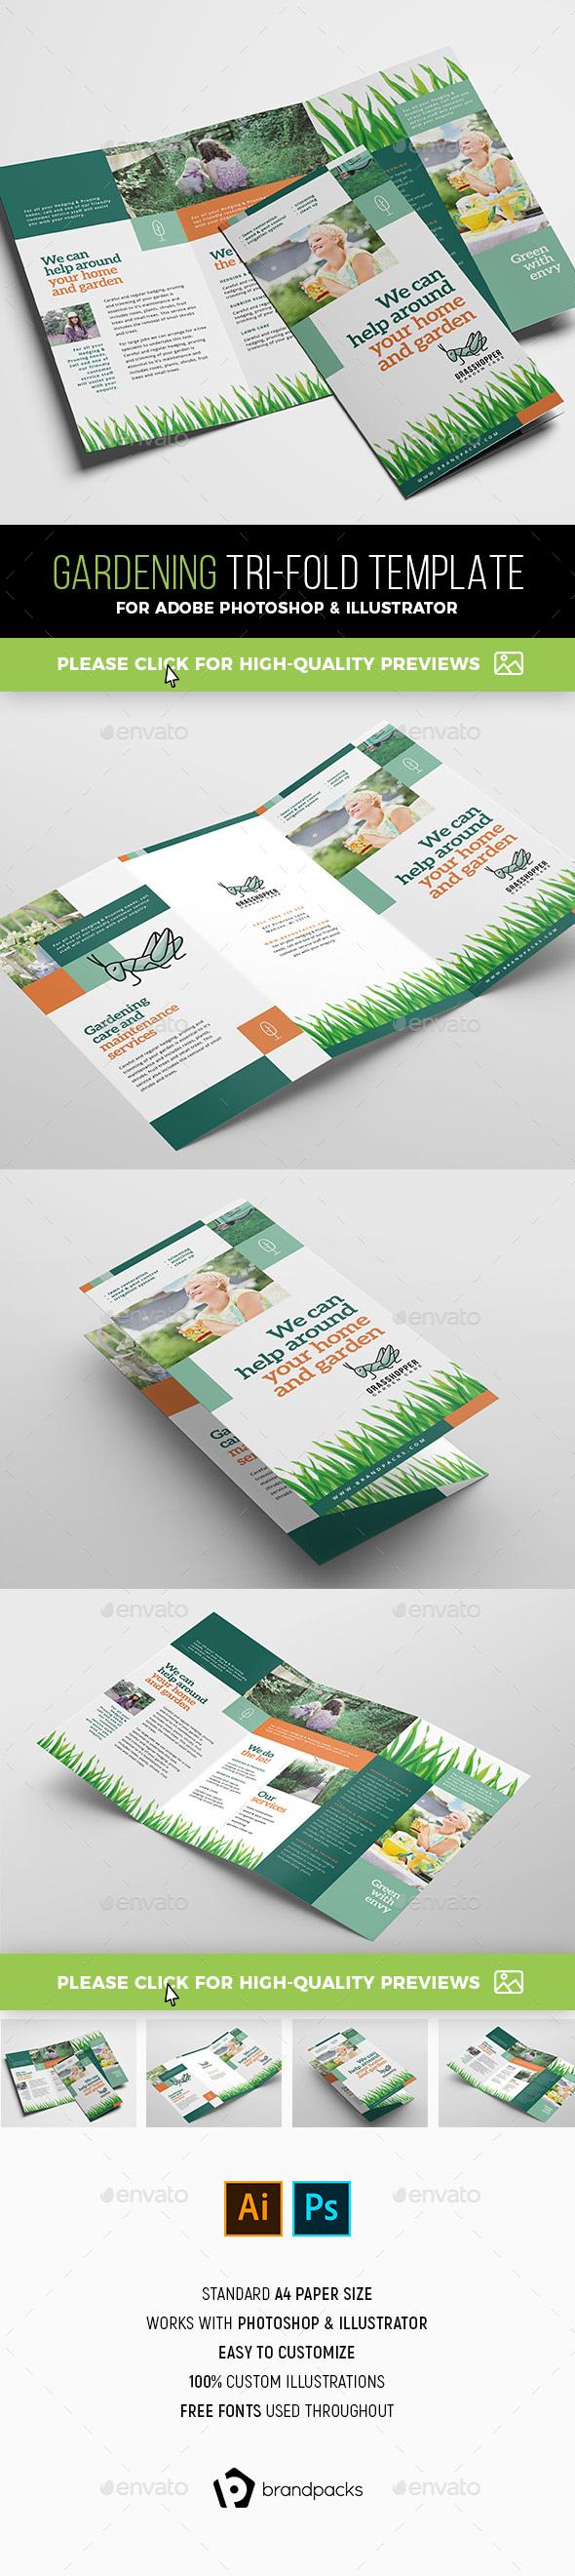 Gardening Tri-Fold Brochure Template - Corporate Brochures